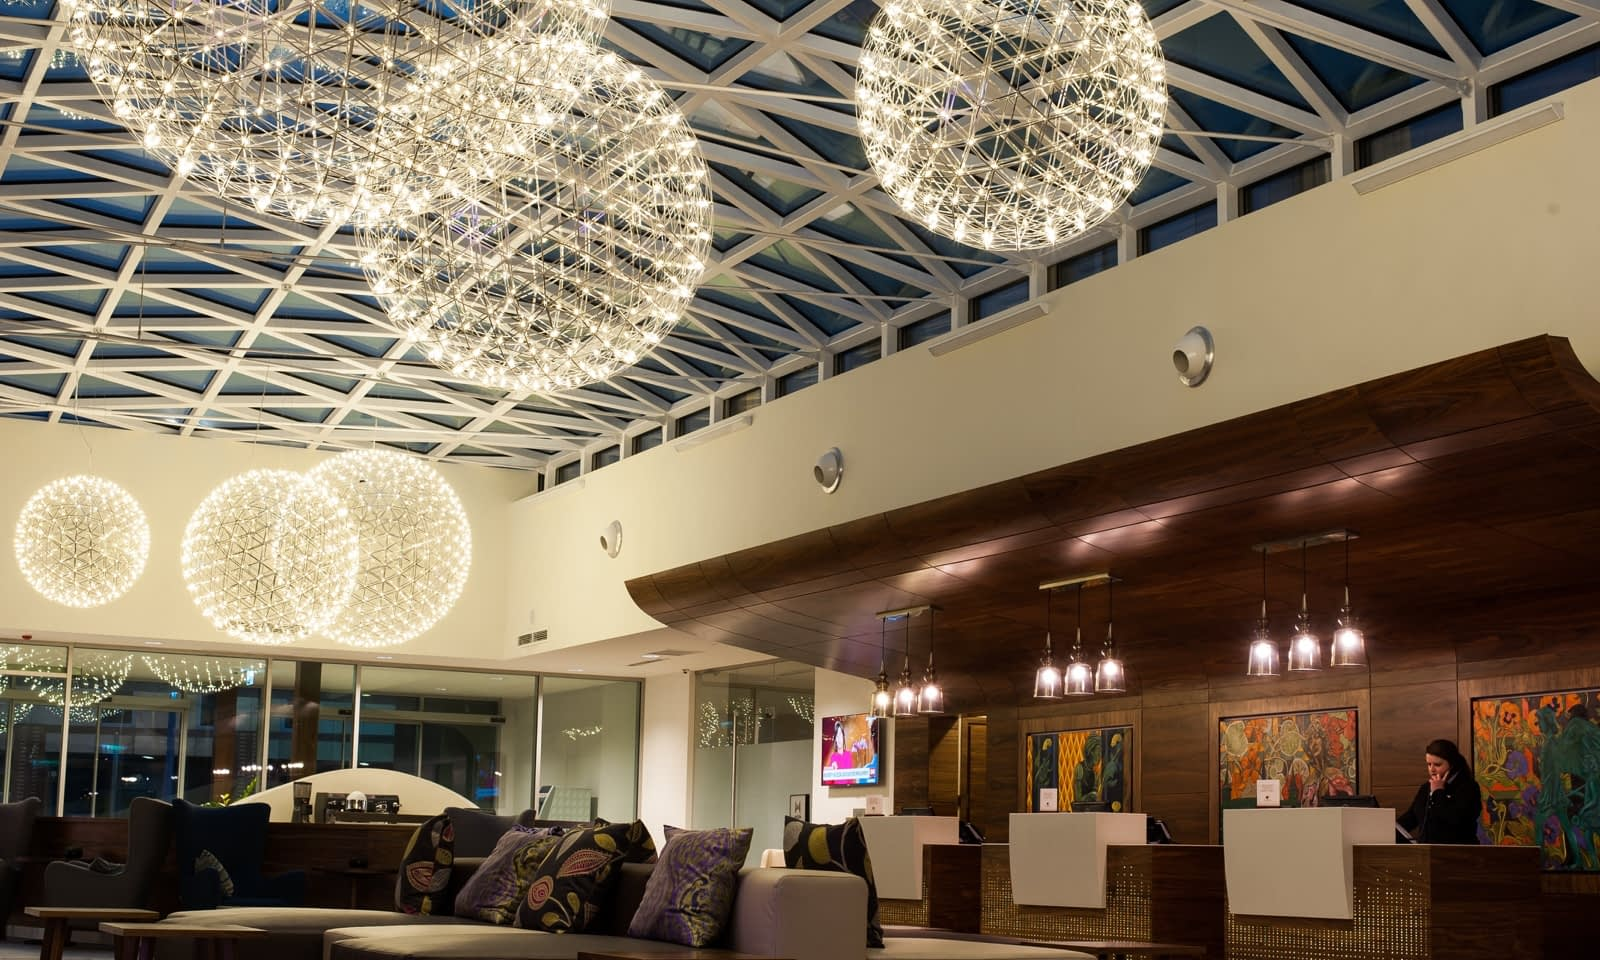 Instalacja AV w kompleksie DoubleTree by Hilton Krakow Hotel & Convention Center Brill AV Media